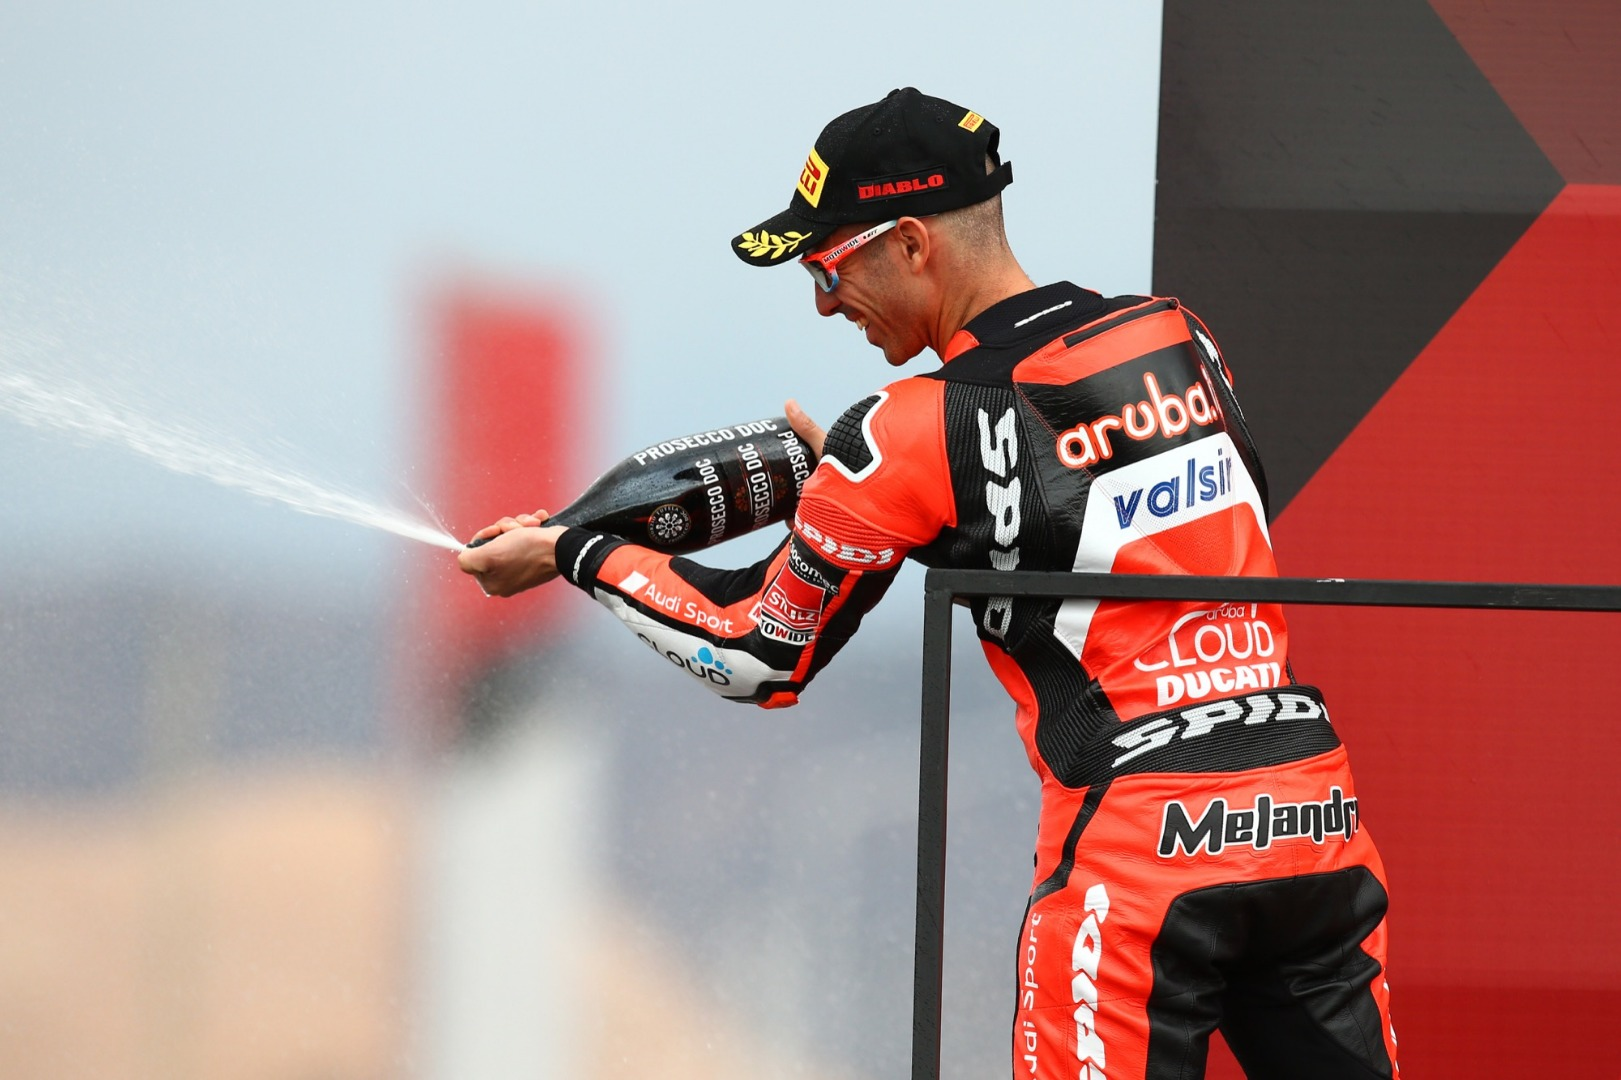 Marco Melandri se retira - Carrera deportiva en fotos